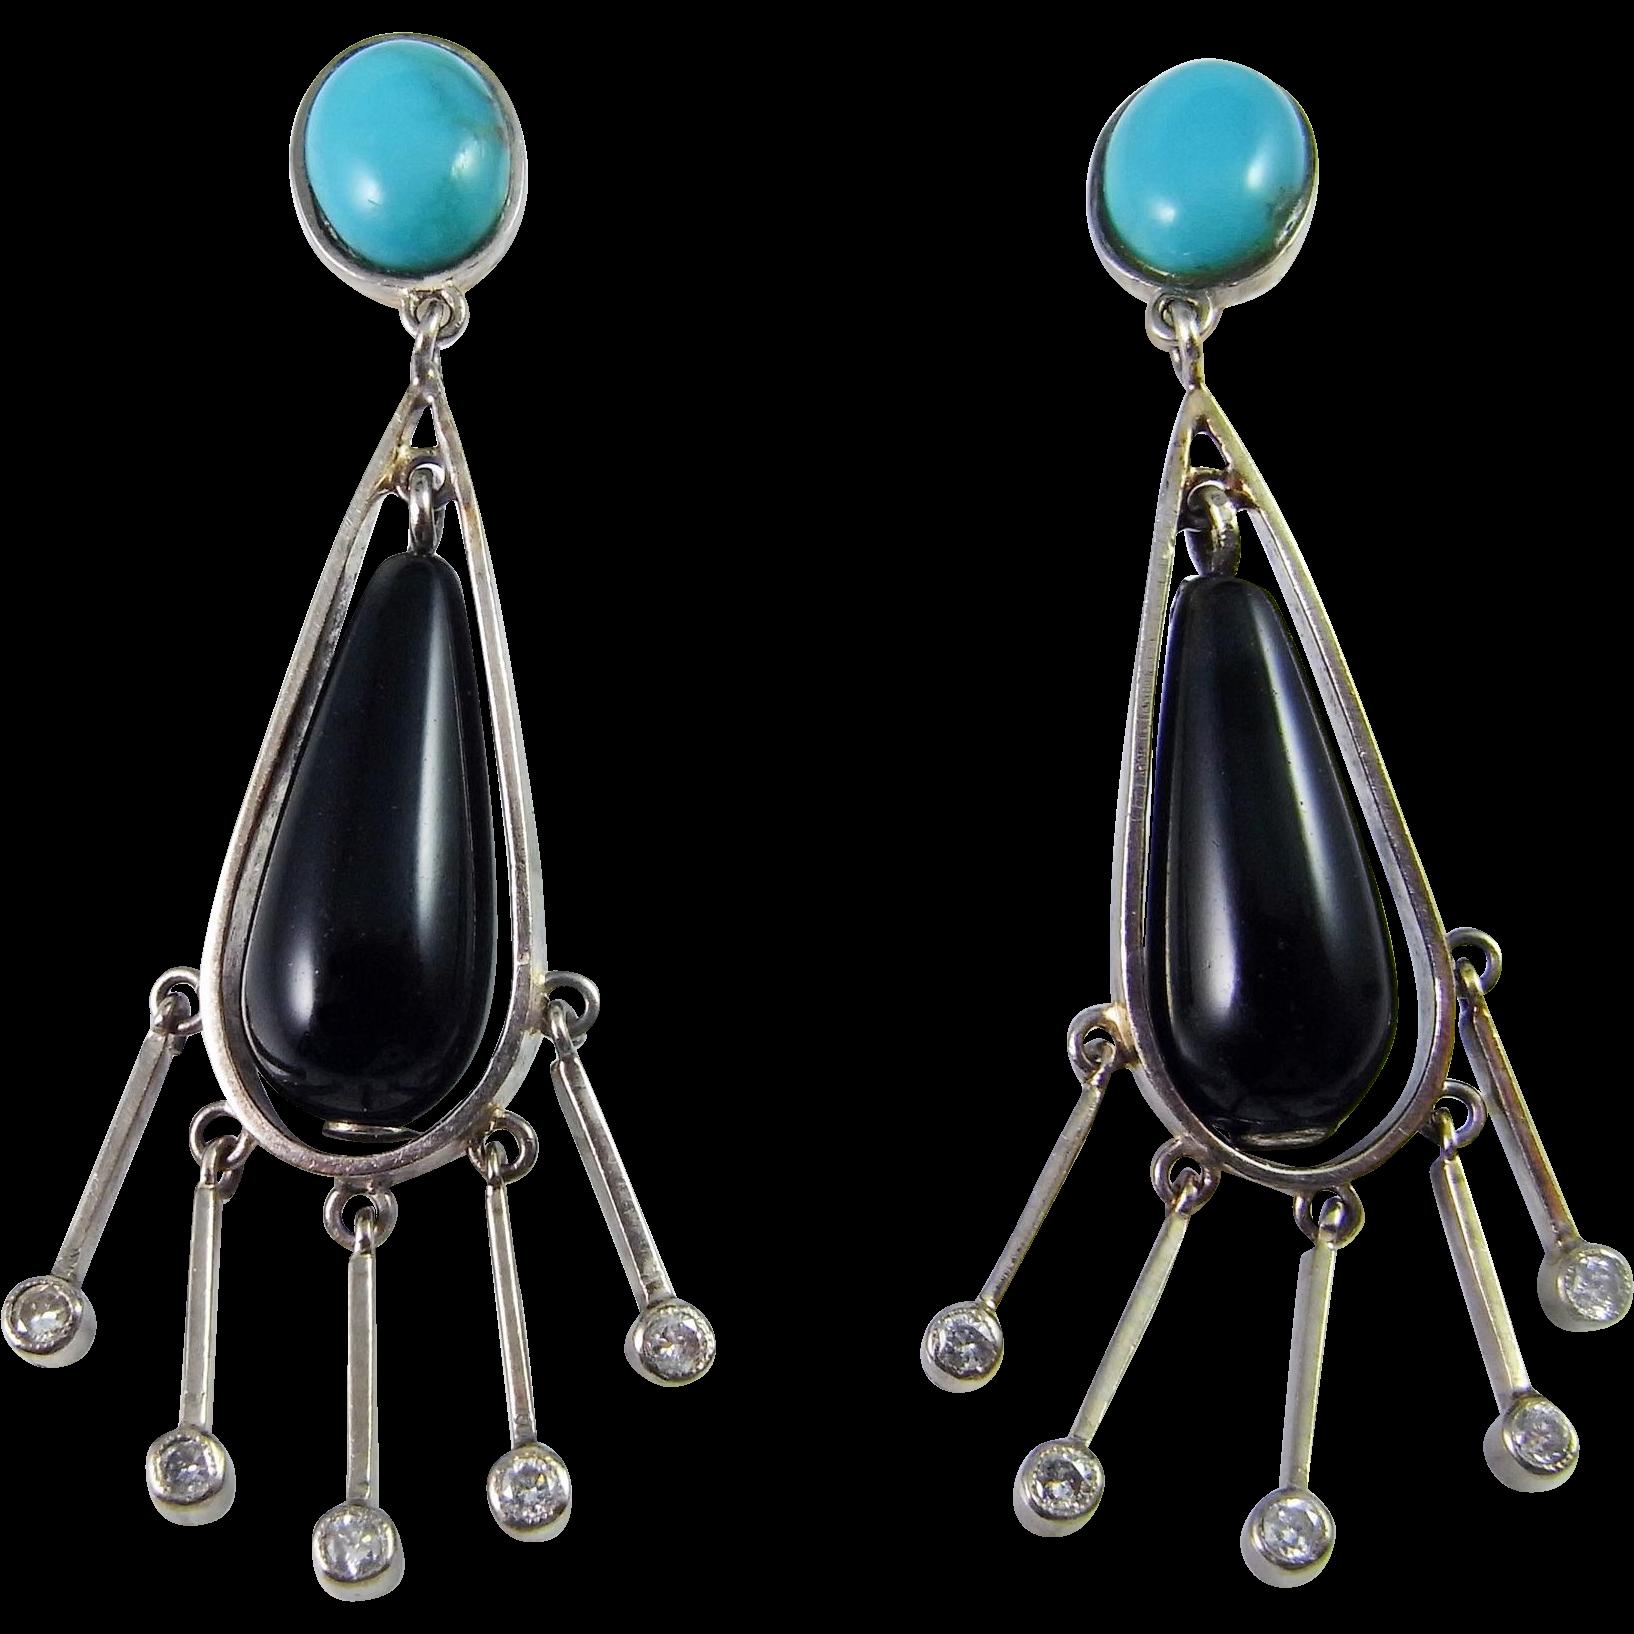 Art Deco Diamond Earrings 18k Gold Turquoise Diamond Drop Earrings Onyx  Dangle Earrings 1940s 1930s 1920s Handmade Chandelier One Of A Kind High  End Luxury